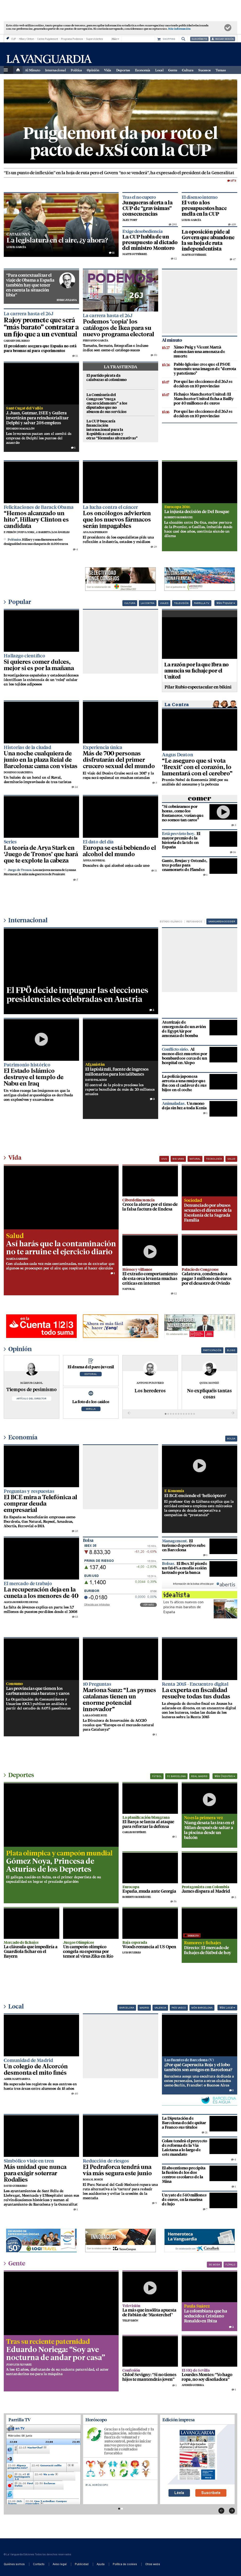 La Vanguardia at Wednesday June 8, 2016, 1:33 p.m. UTC